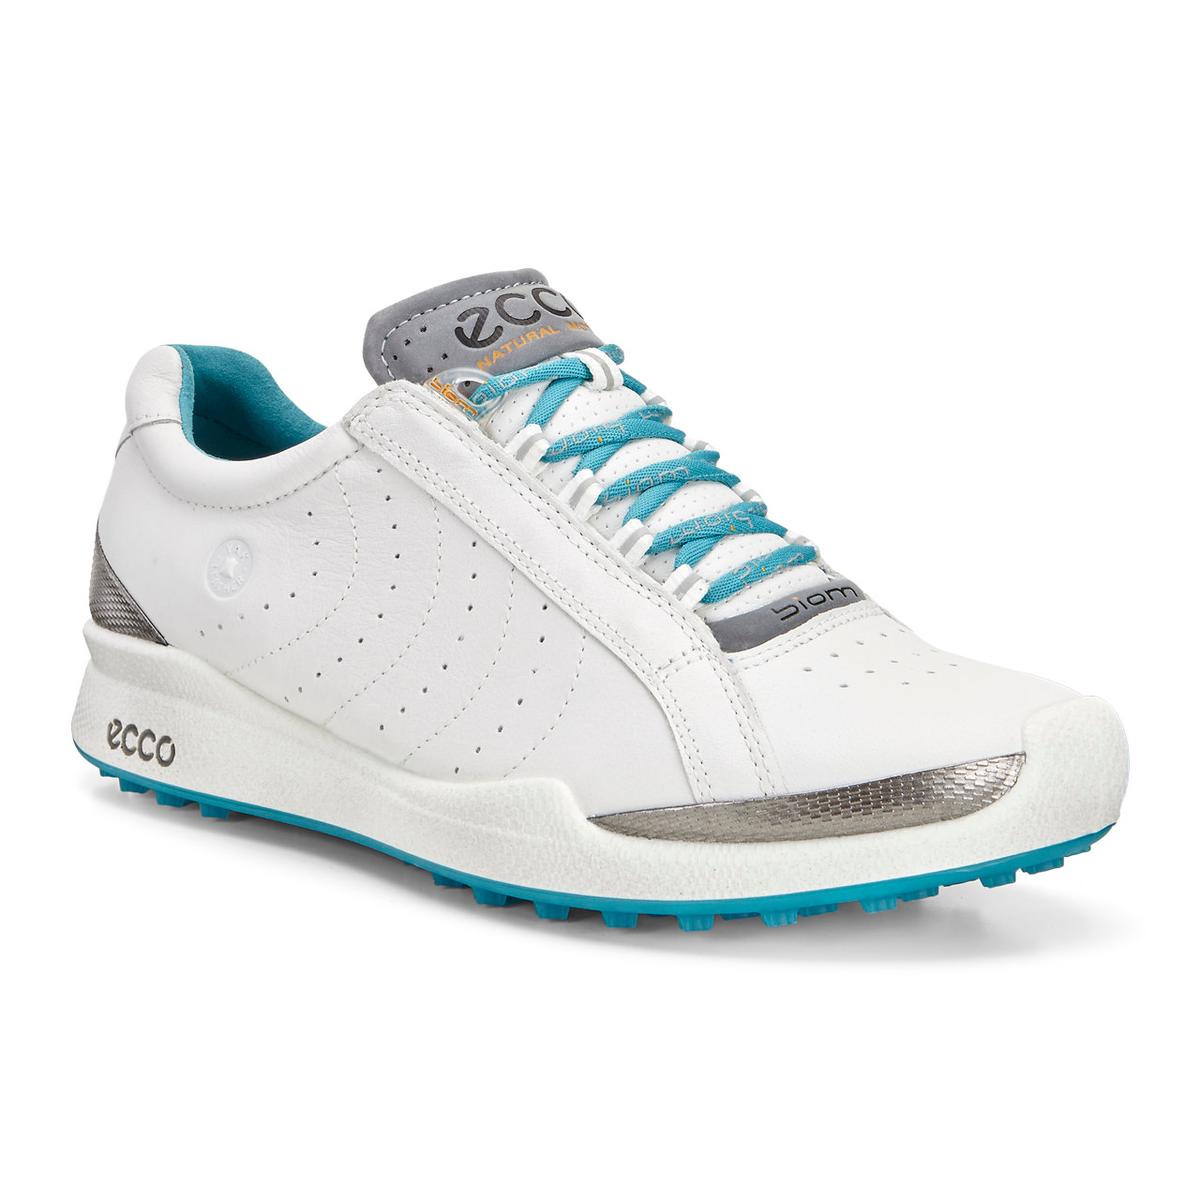 f943c276ed ECCO BIOM Hybrid Women's Golf Shoe - White